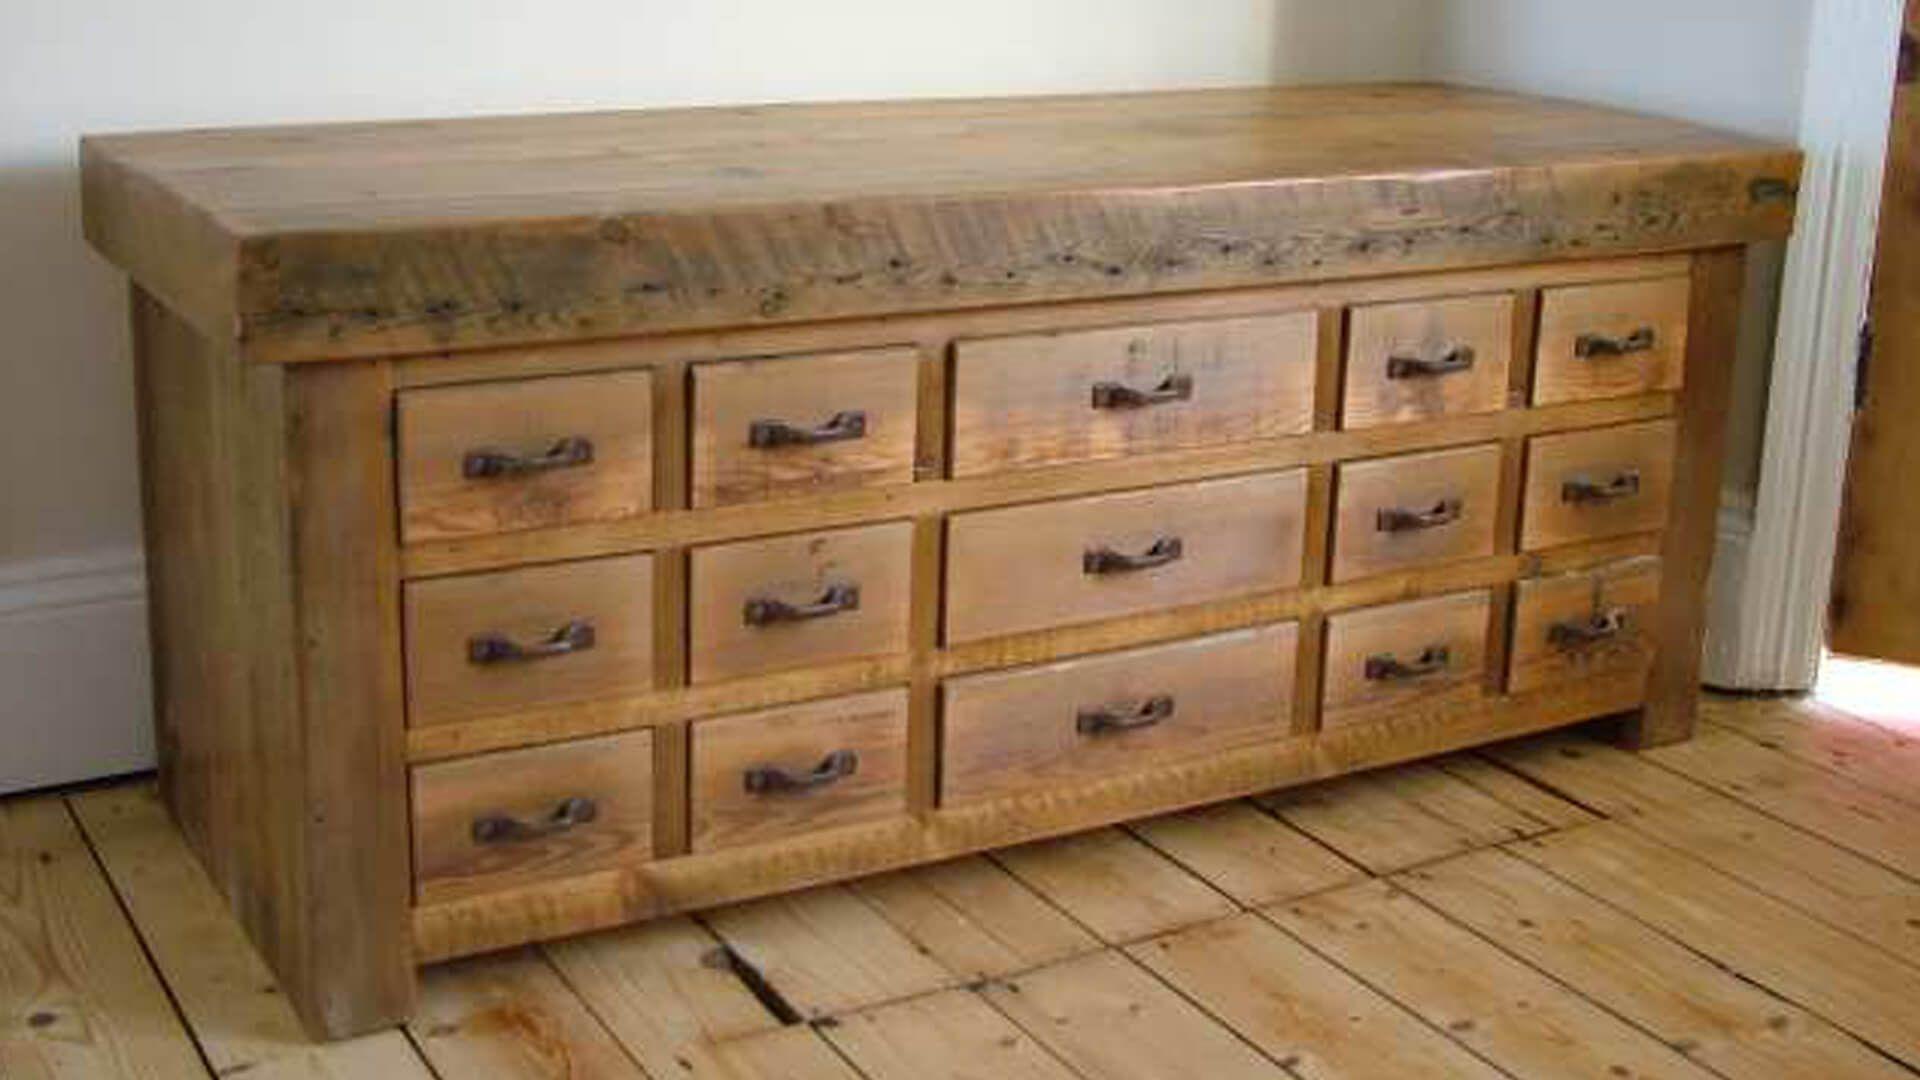 Bespoke Wooden Furniture Reclaimed Pine Bedroom Drawers Born Of Wood Furniture Furniture Disposal Pine Bedroom